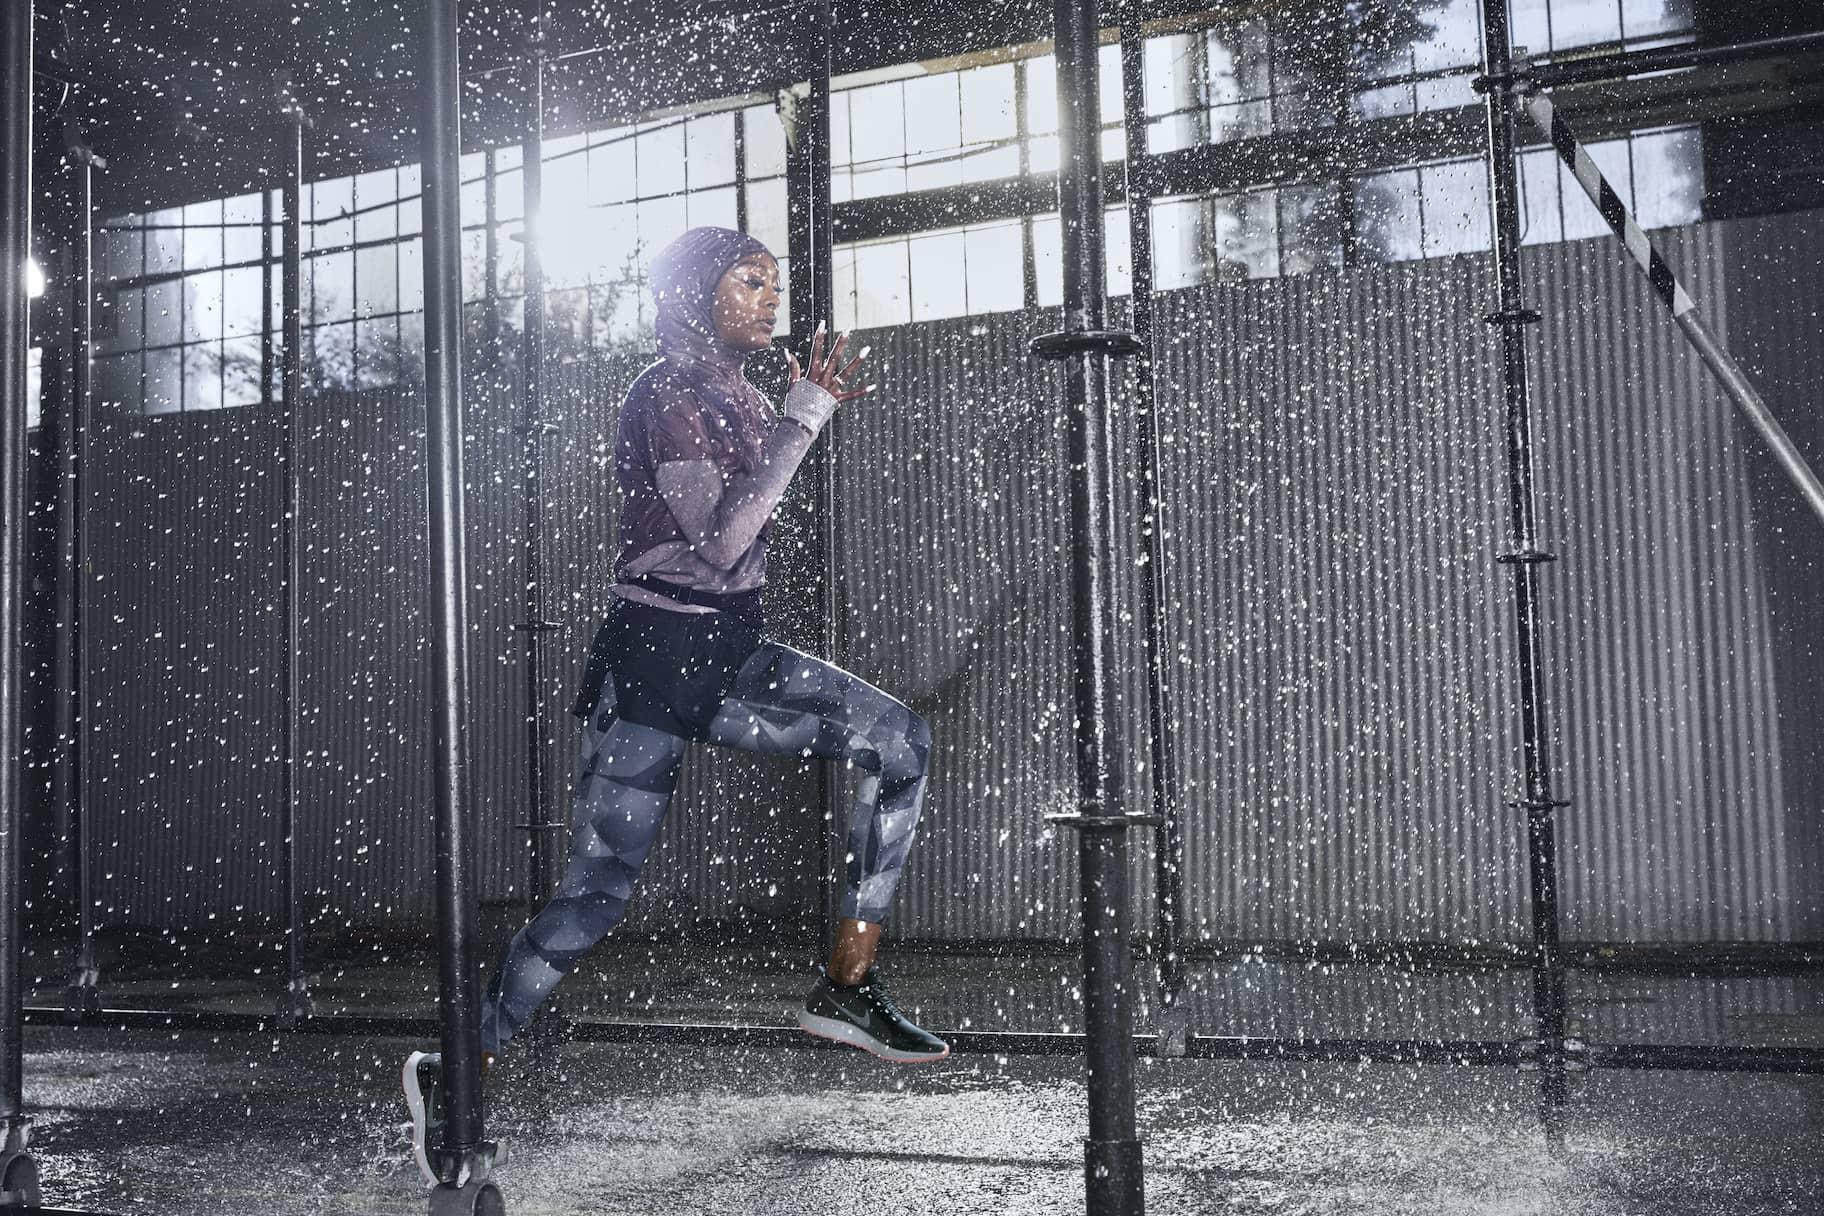 Waterproof Running Gear for Rainy-Day Runs